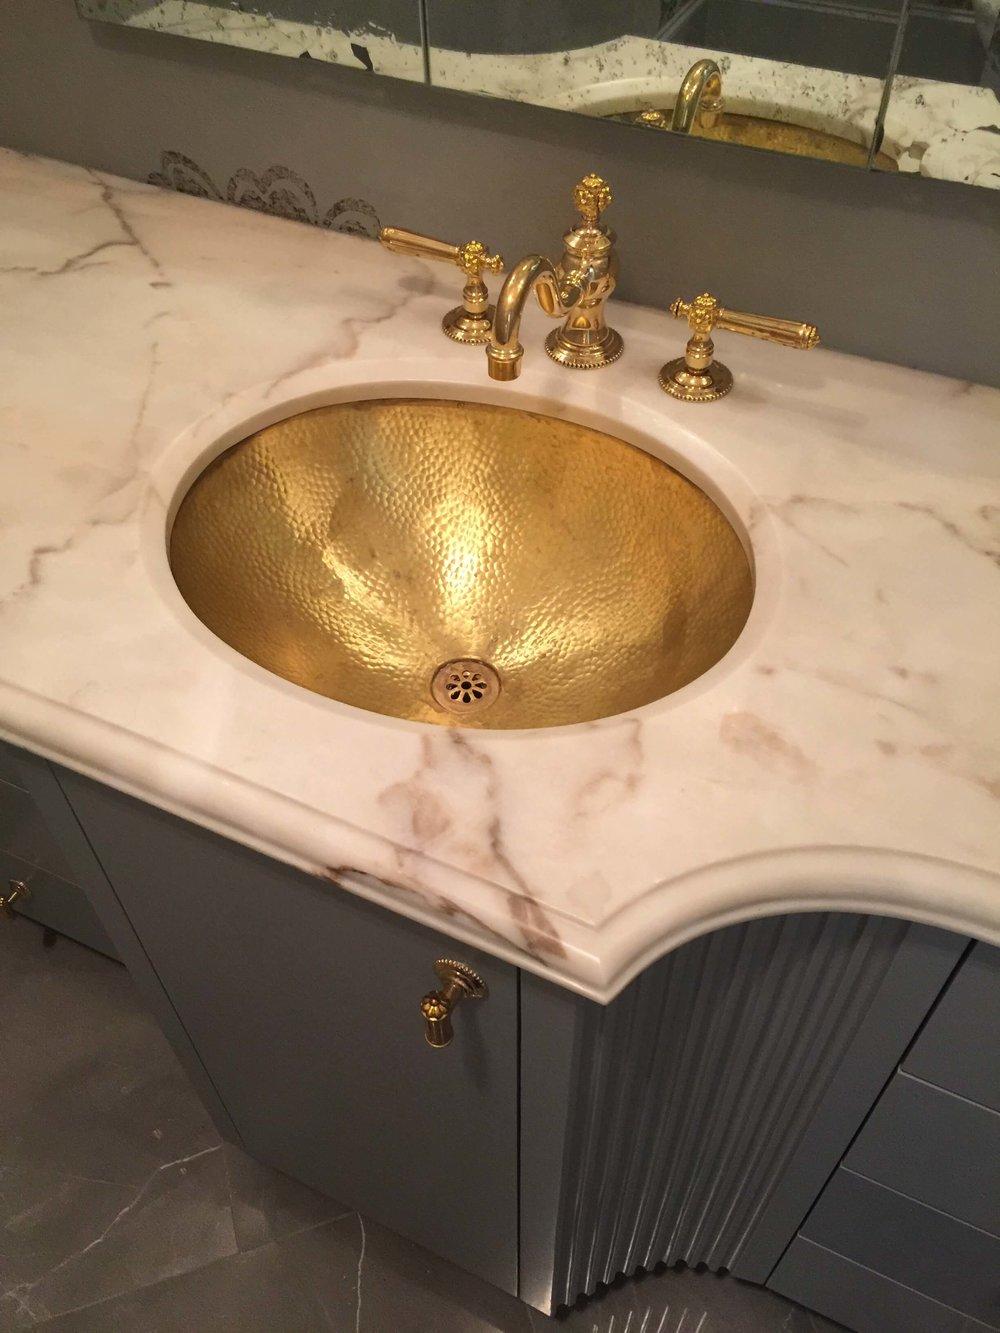 POWDER BATH ROUND UP |Powder bath with brass hammered sink and faucet | Designer:  Beth Lindsey , seen at  ASID Showhouse 2017  #powderbath #powderroom